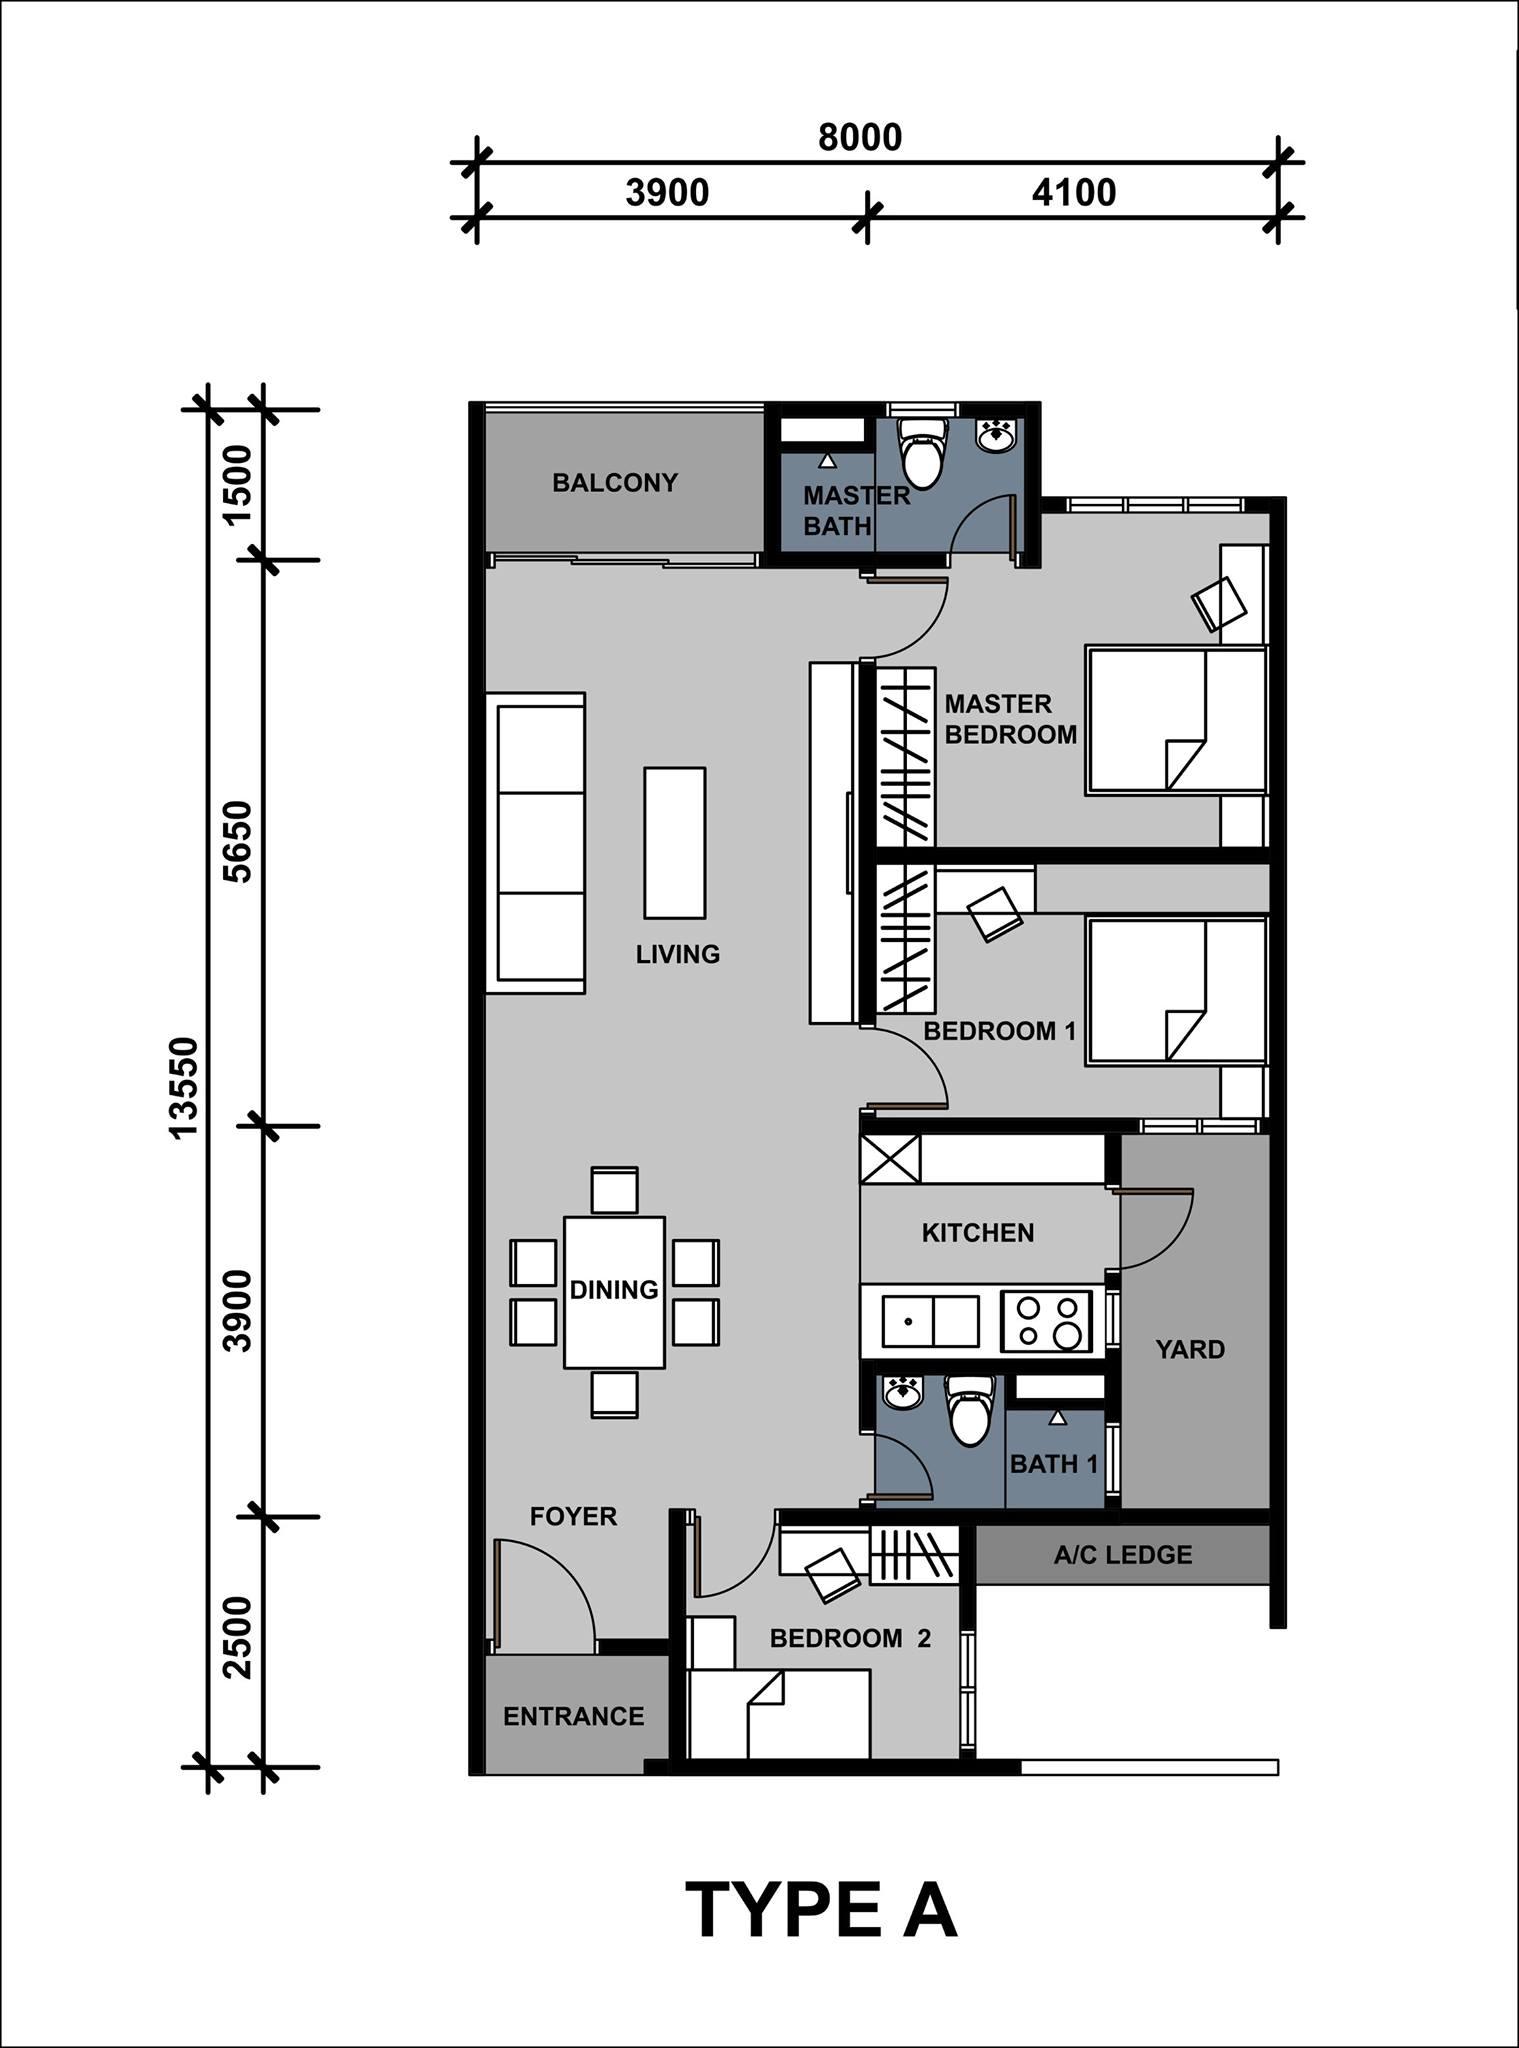 Lavender-Residence-1,080sqft-3-bedroom